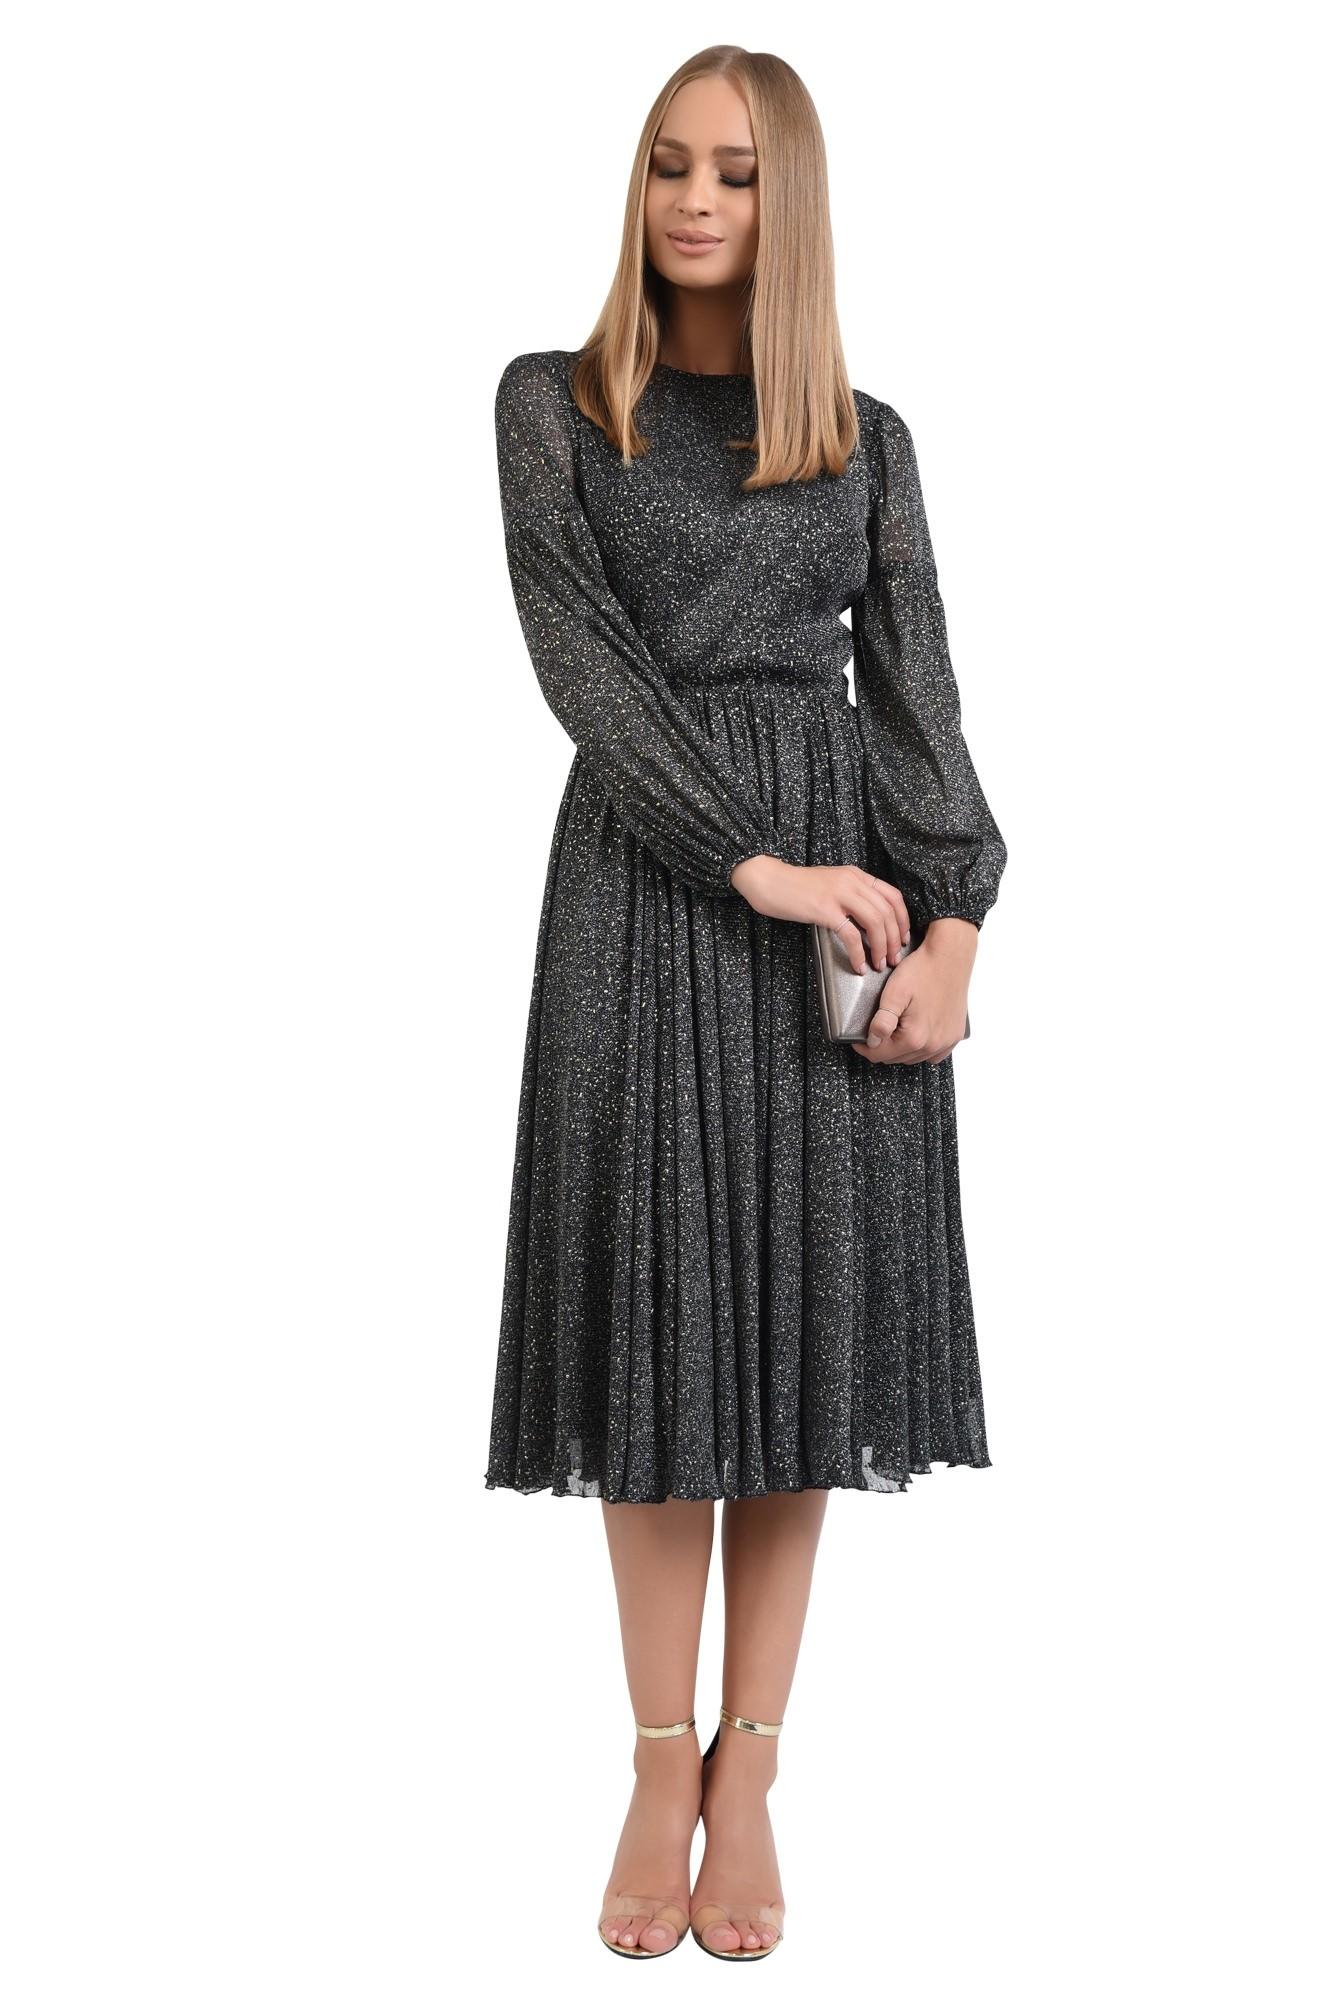 0 - rochie de seara, detalii aurii, rochii online, croi clos